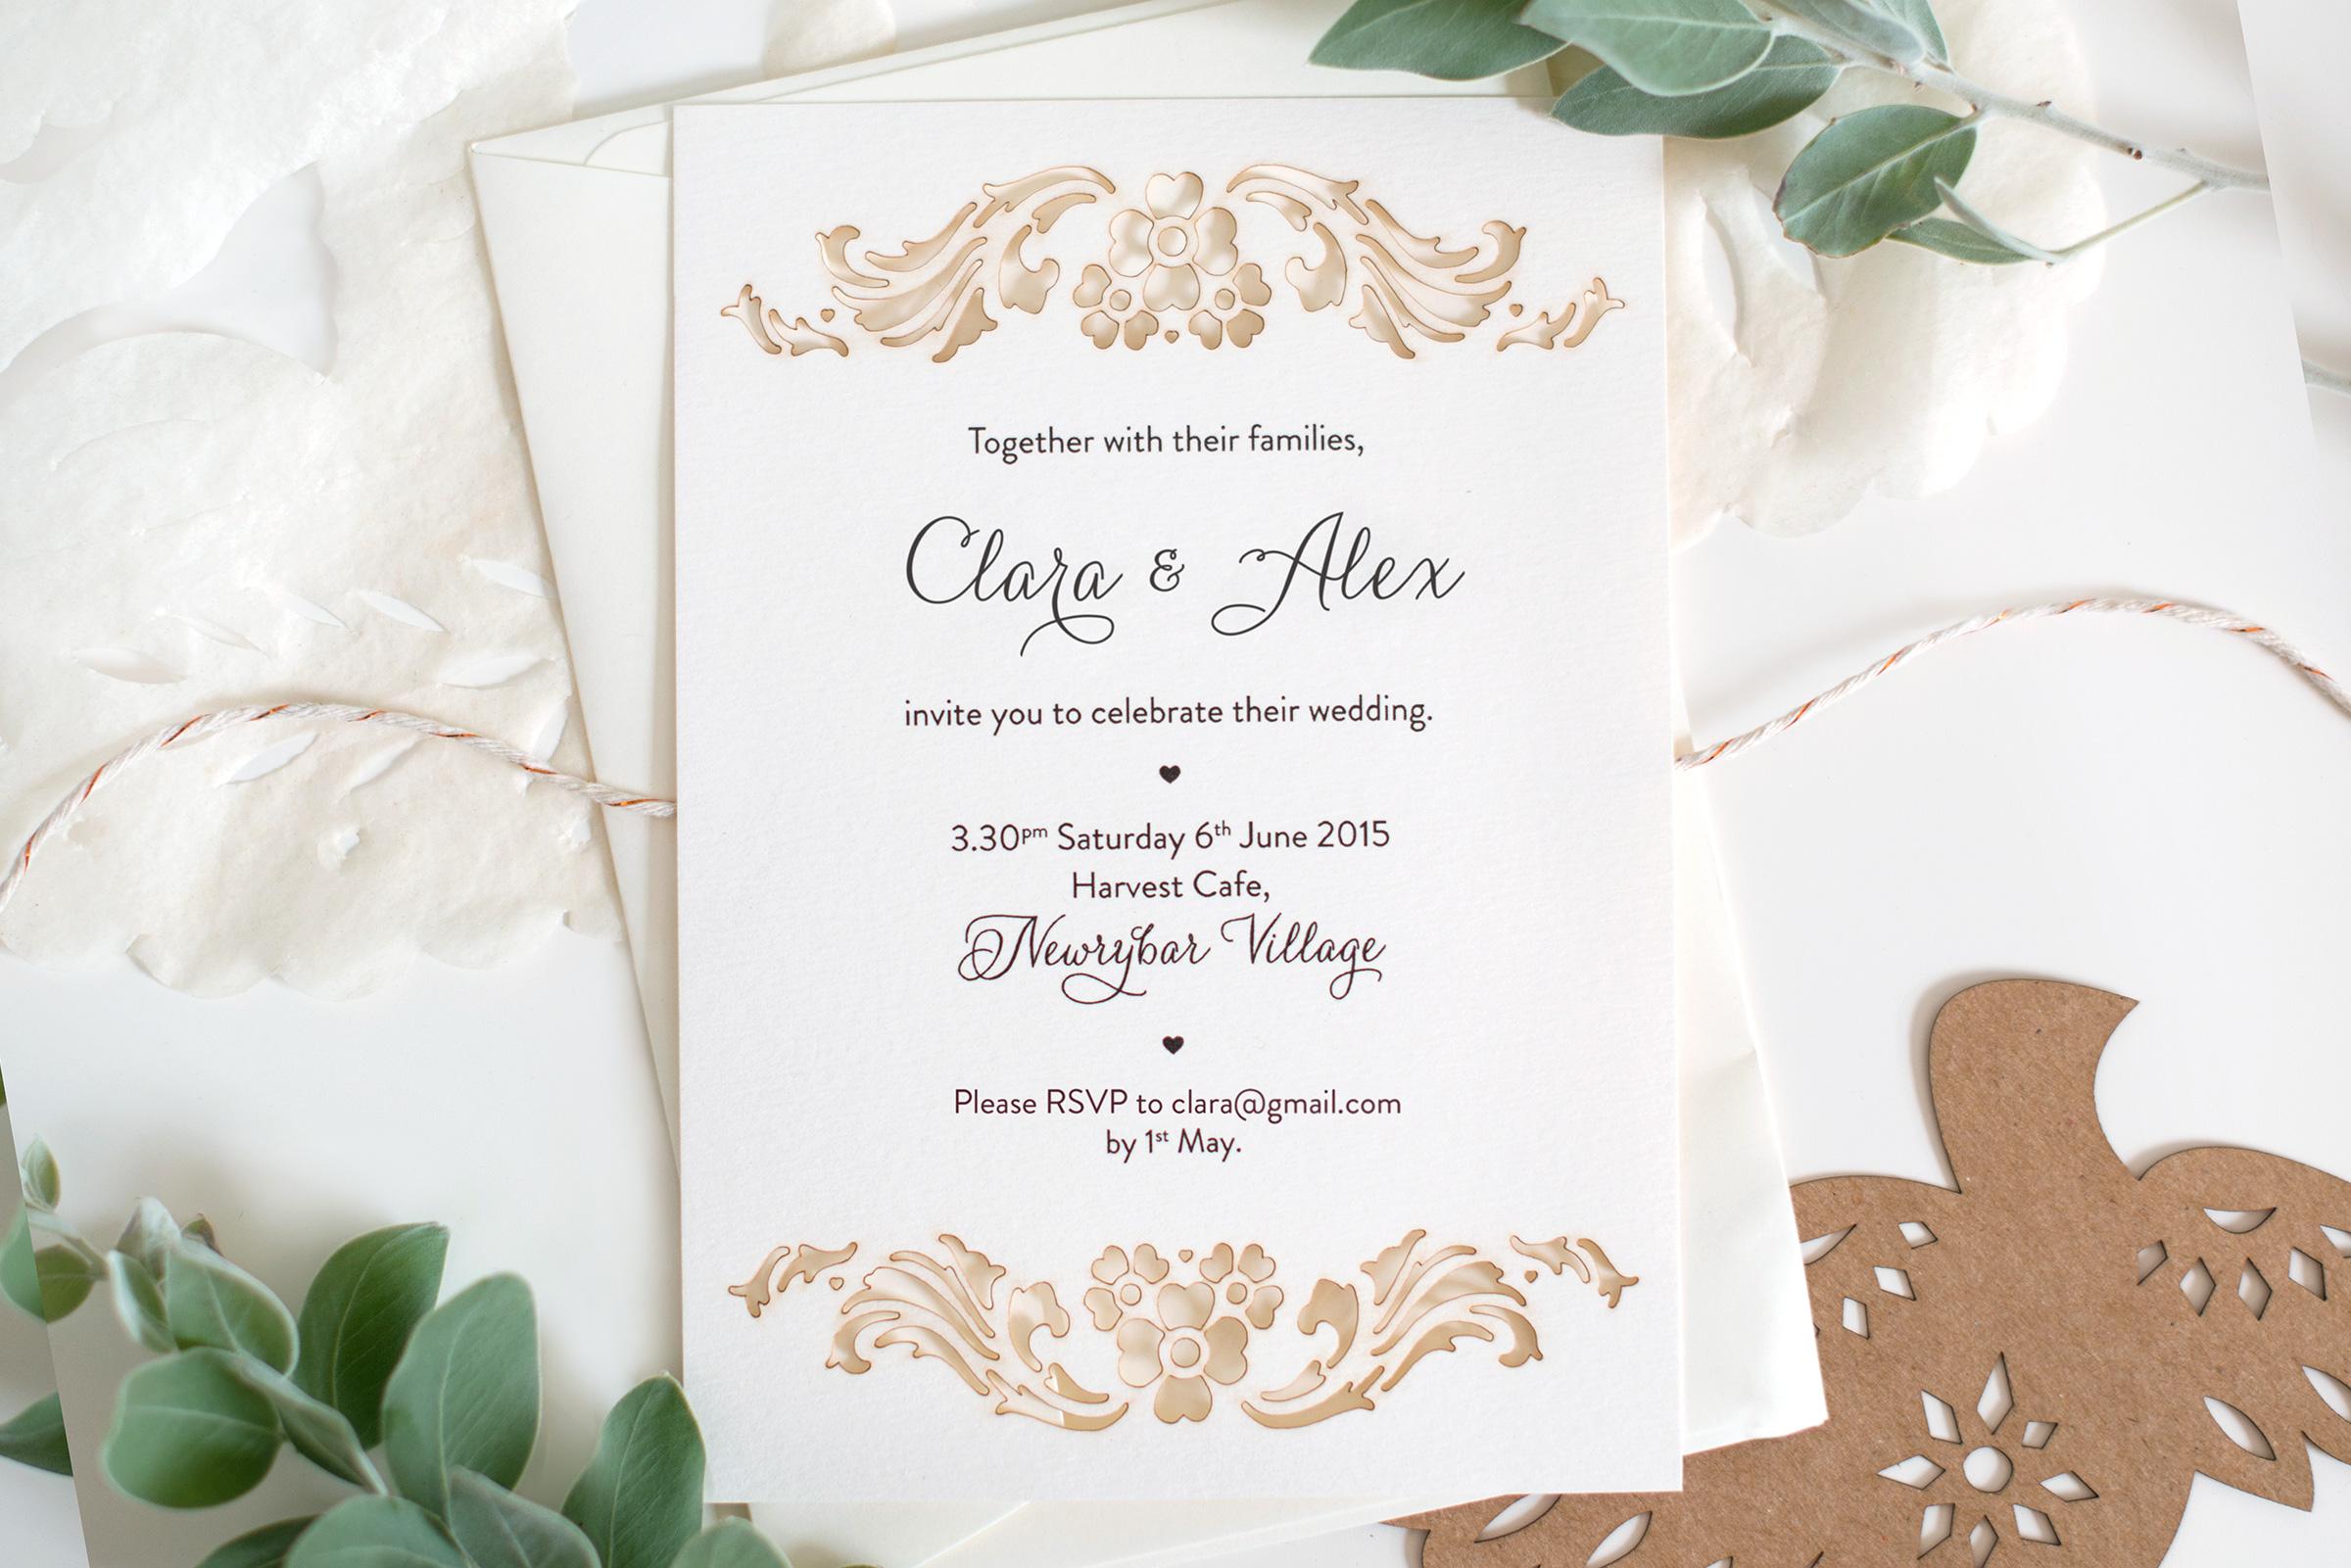 00-Wedding-Invitation-design-by-Foster.jpg